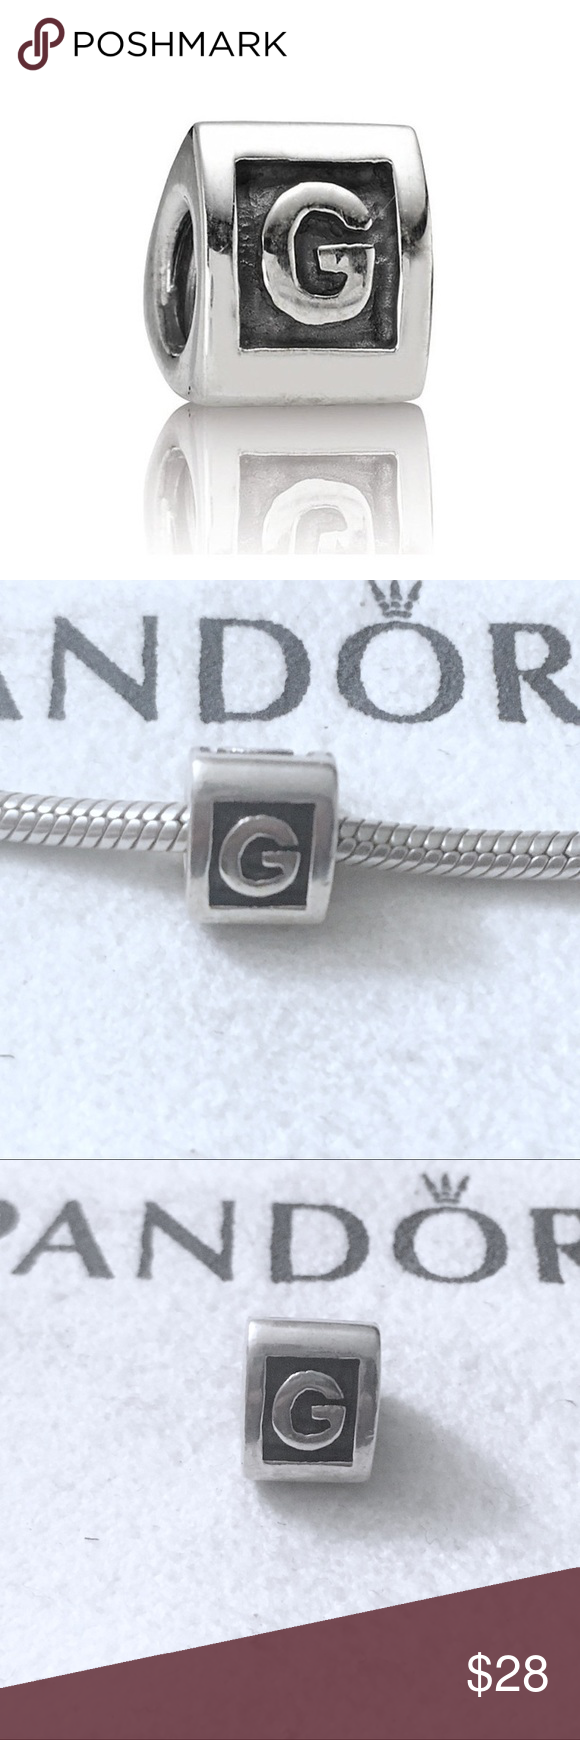 pandora initial g charm